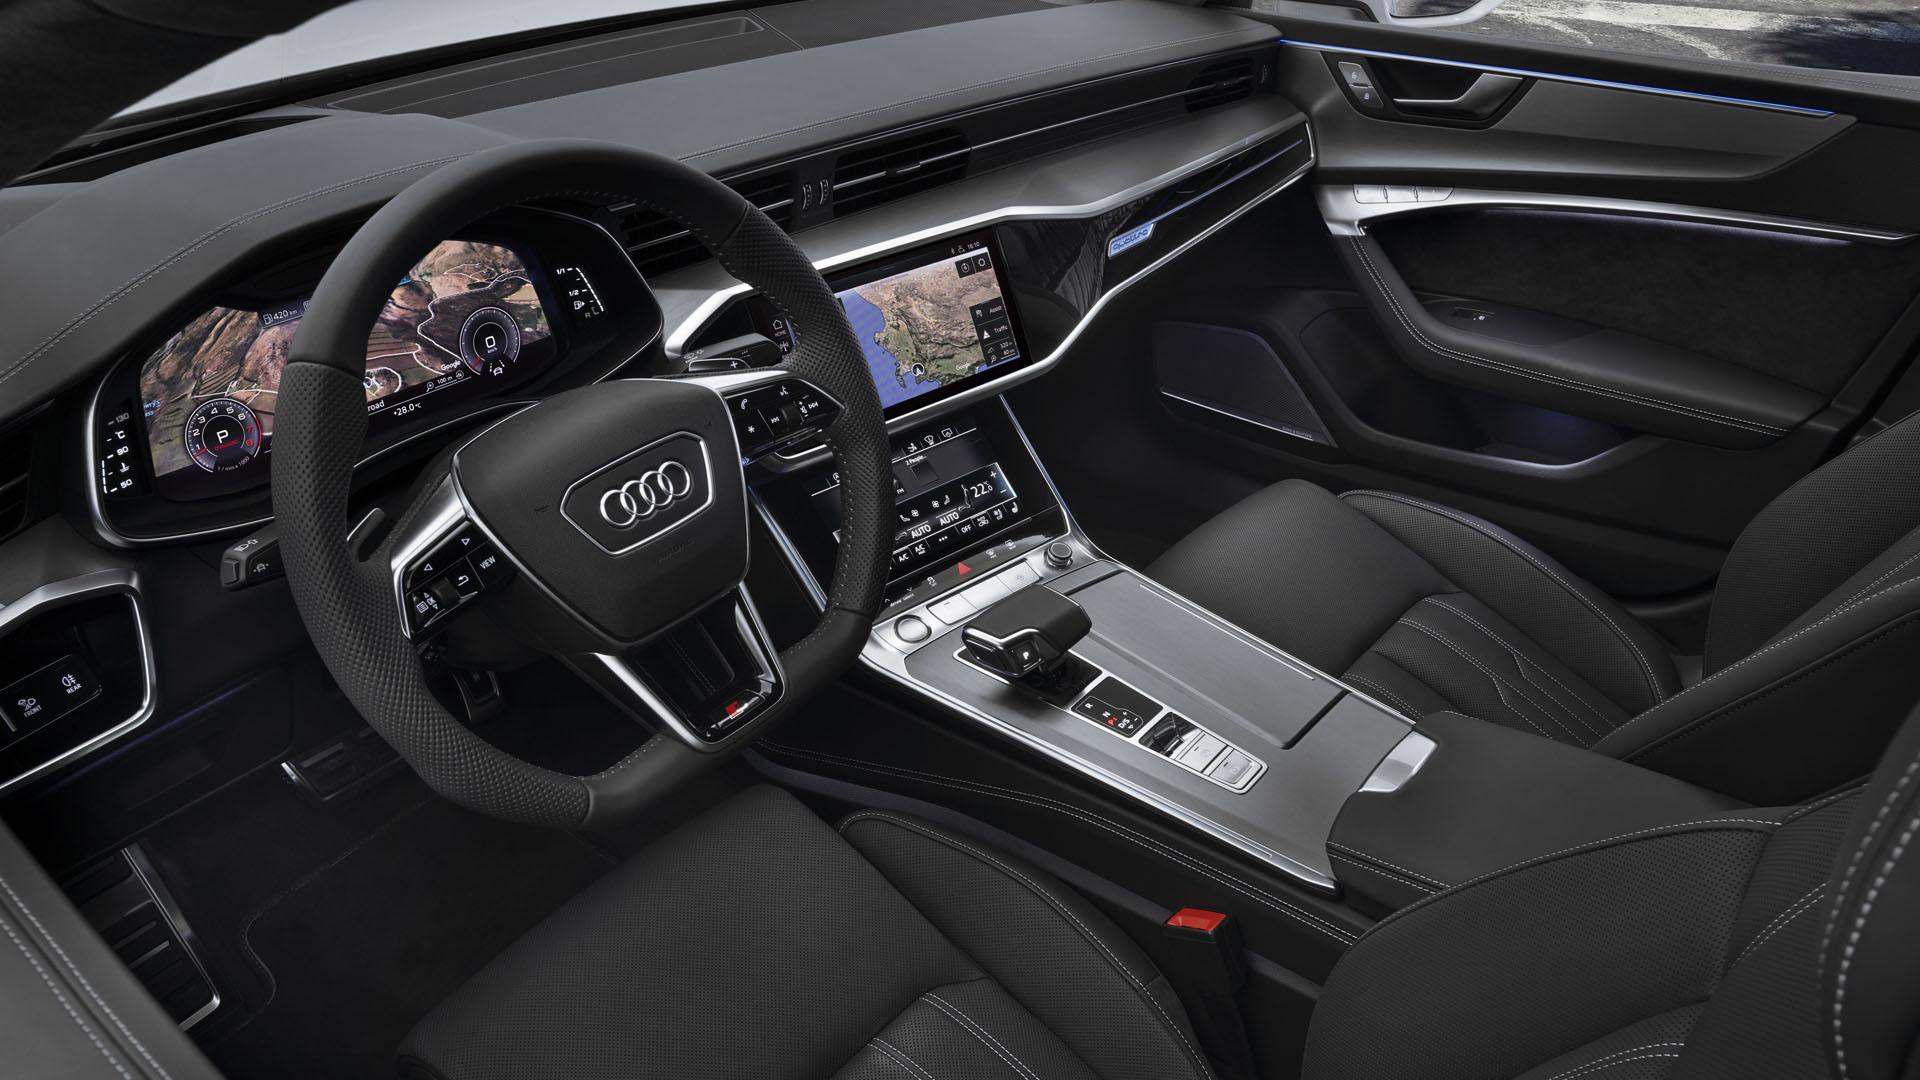 Audi a7 45tfsi quattro